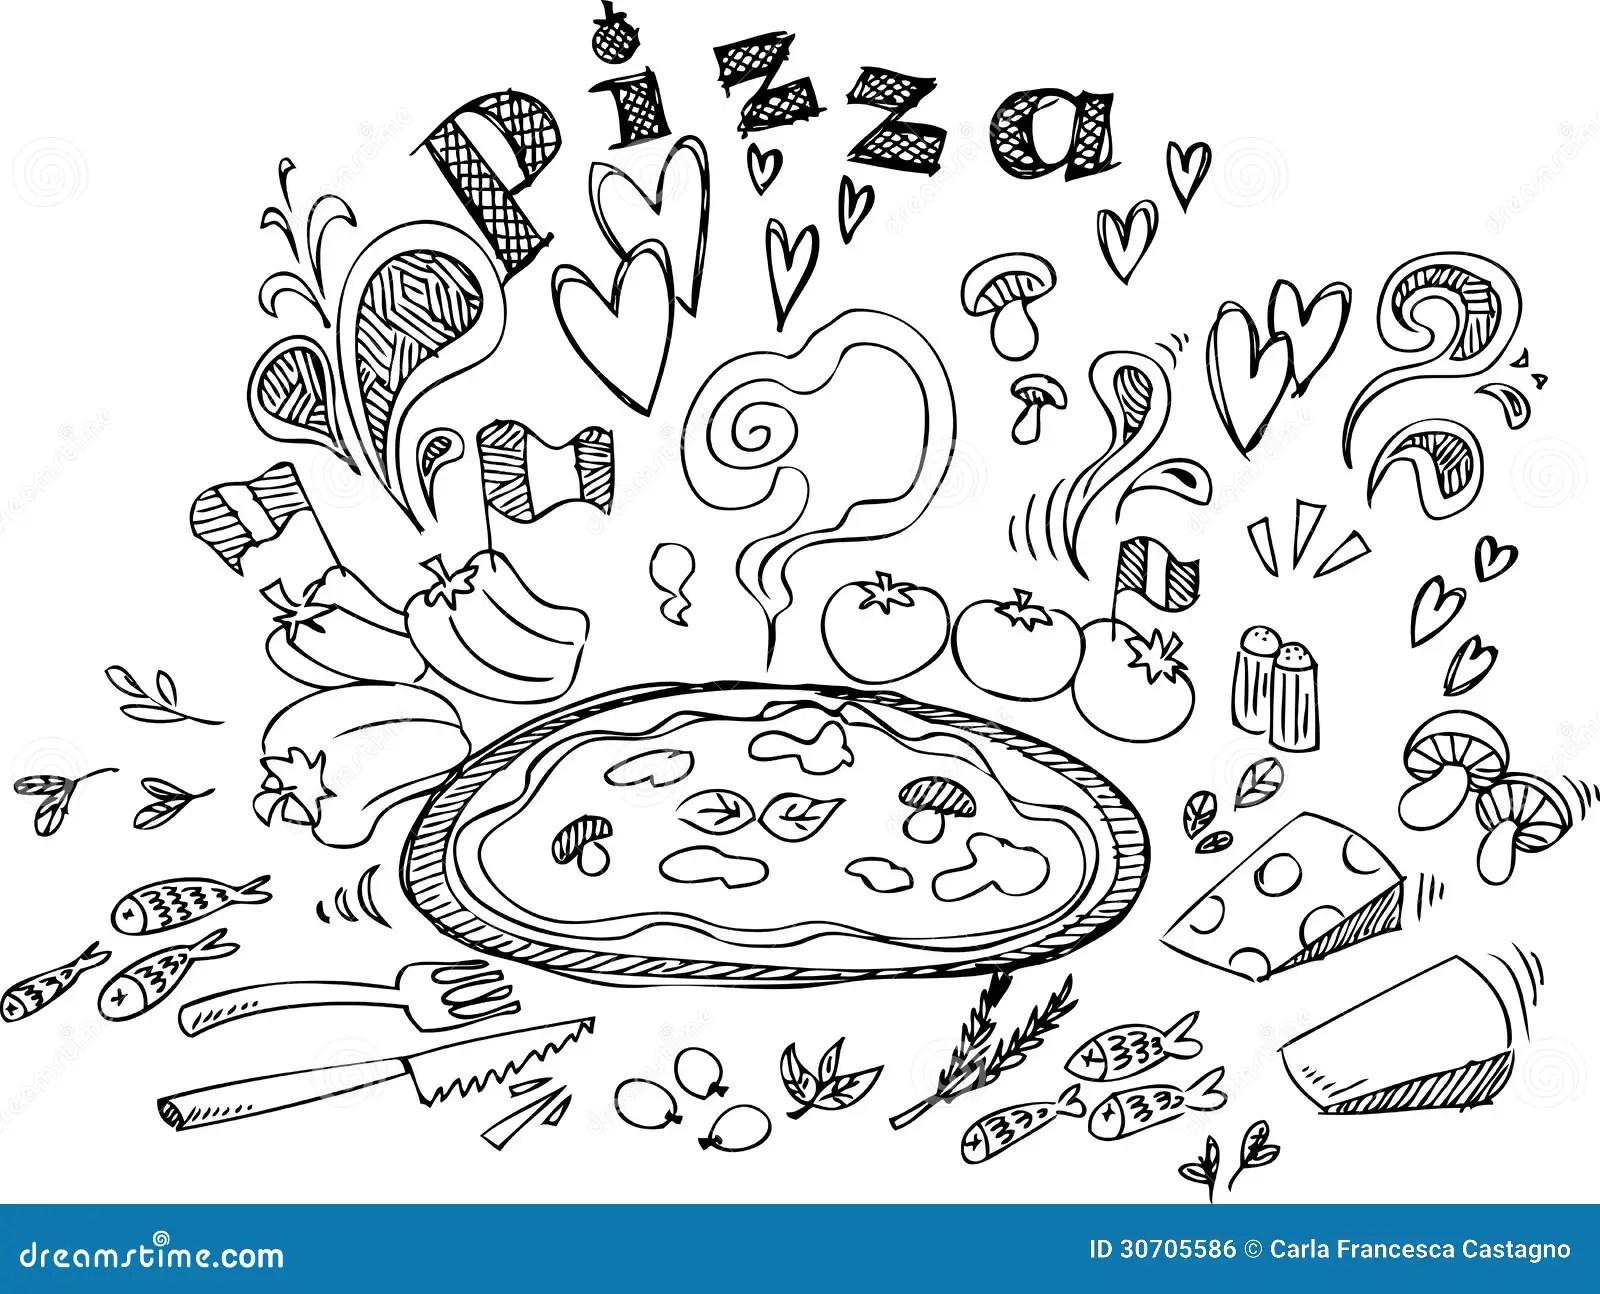 Pizza Ingre Nts Royalty Free Stock Image